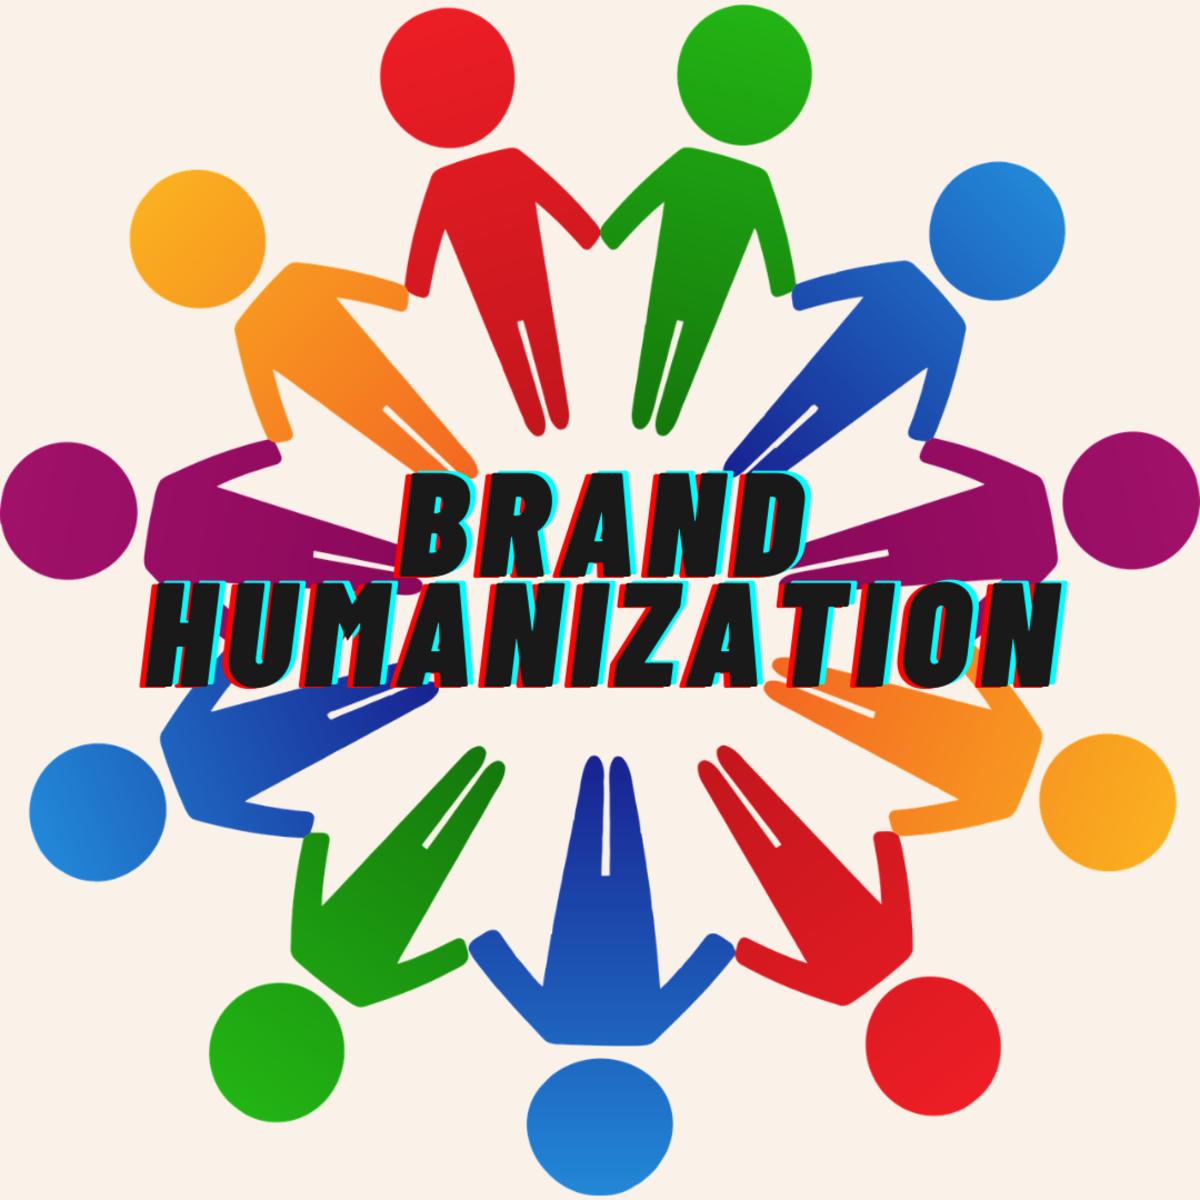 Brand humanization